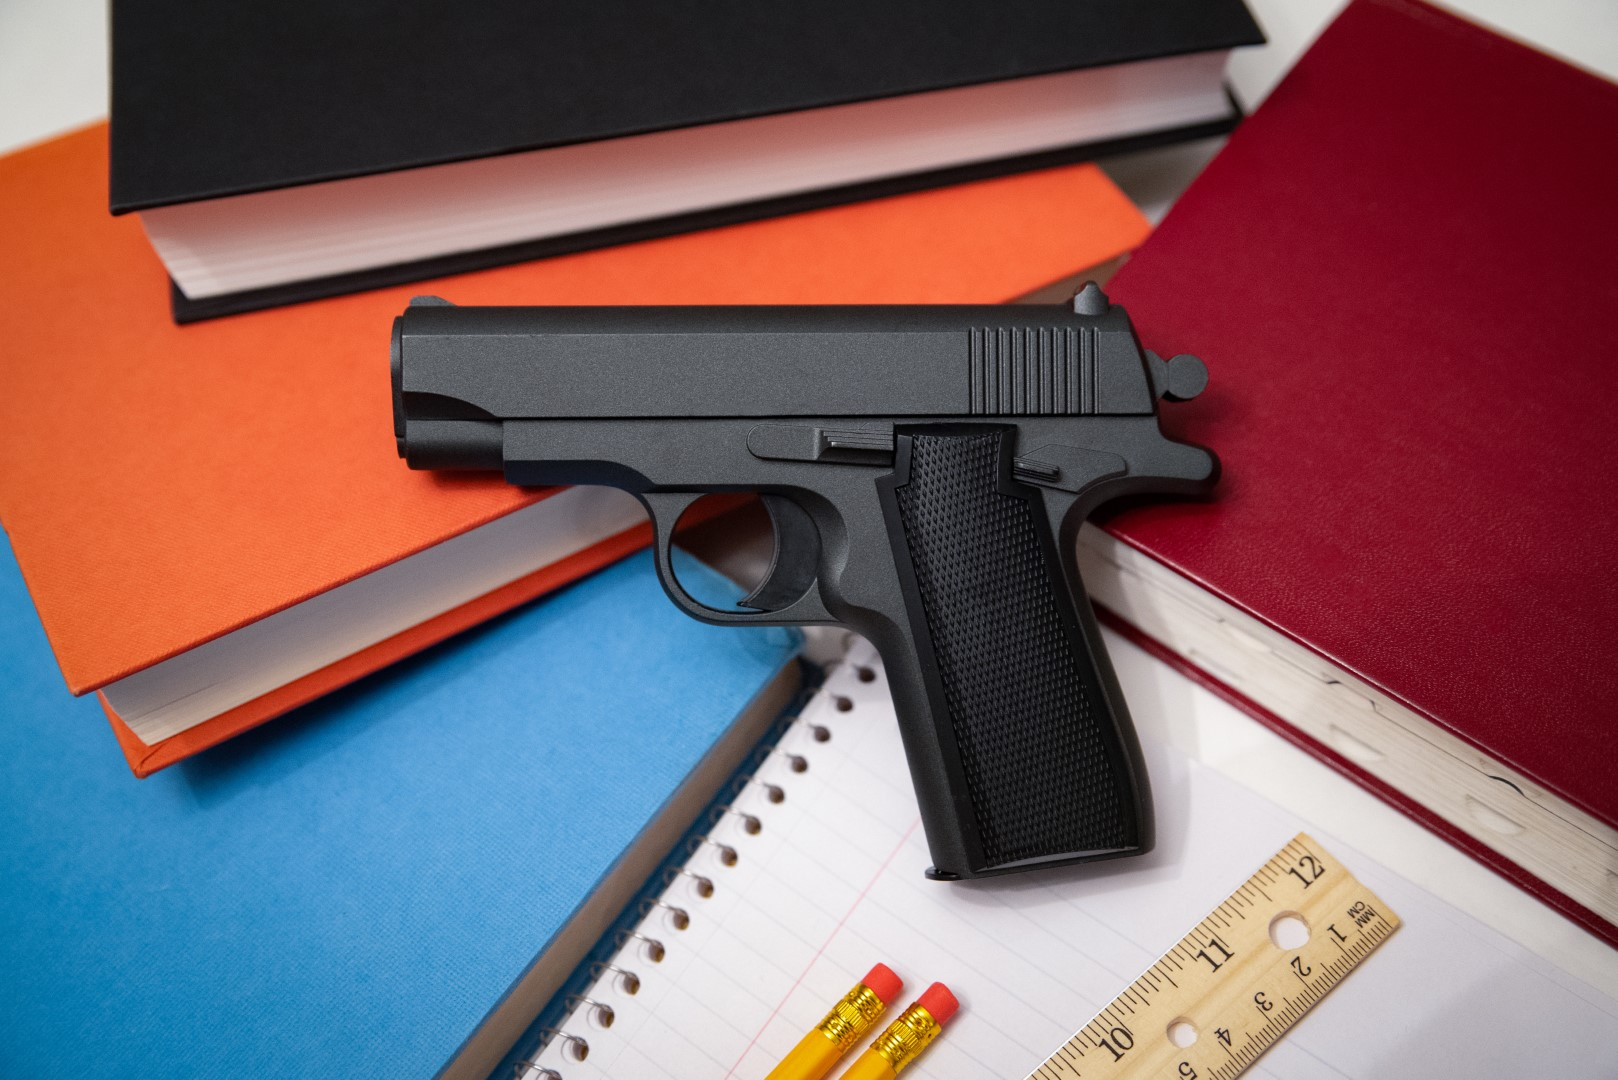 School Supplies and Handgun